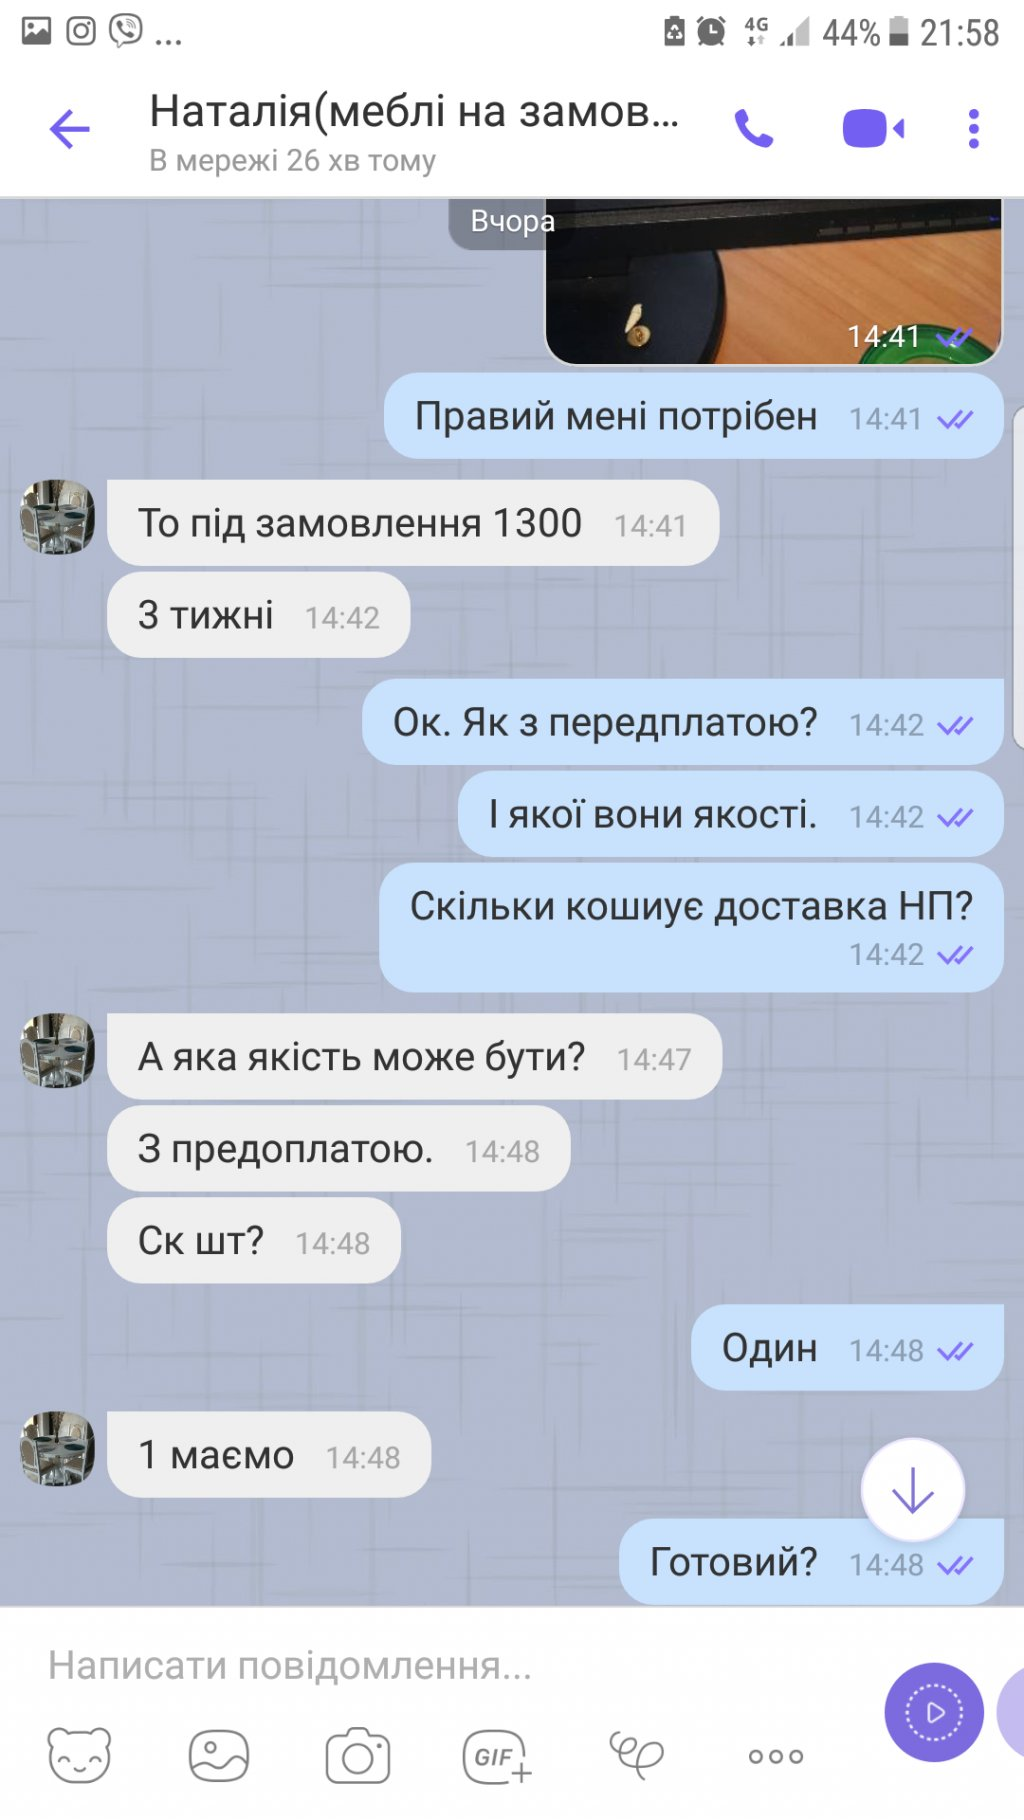 Mebli Karpat Natali (ОЛХ) Сабадош Наталья Юрьевна - Ужасно! МОШЕННИКИ